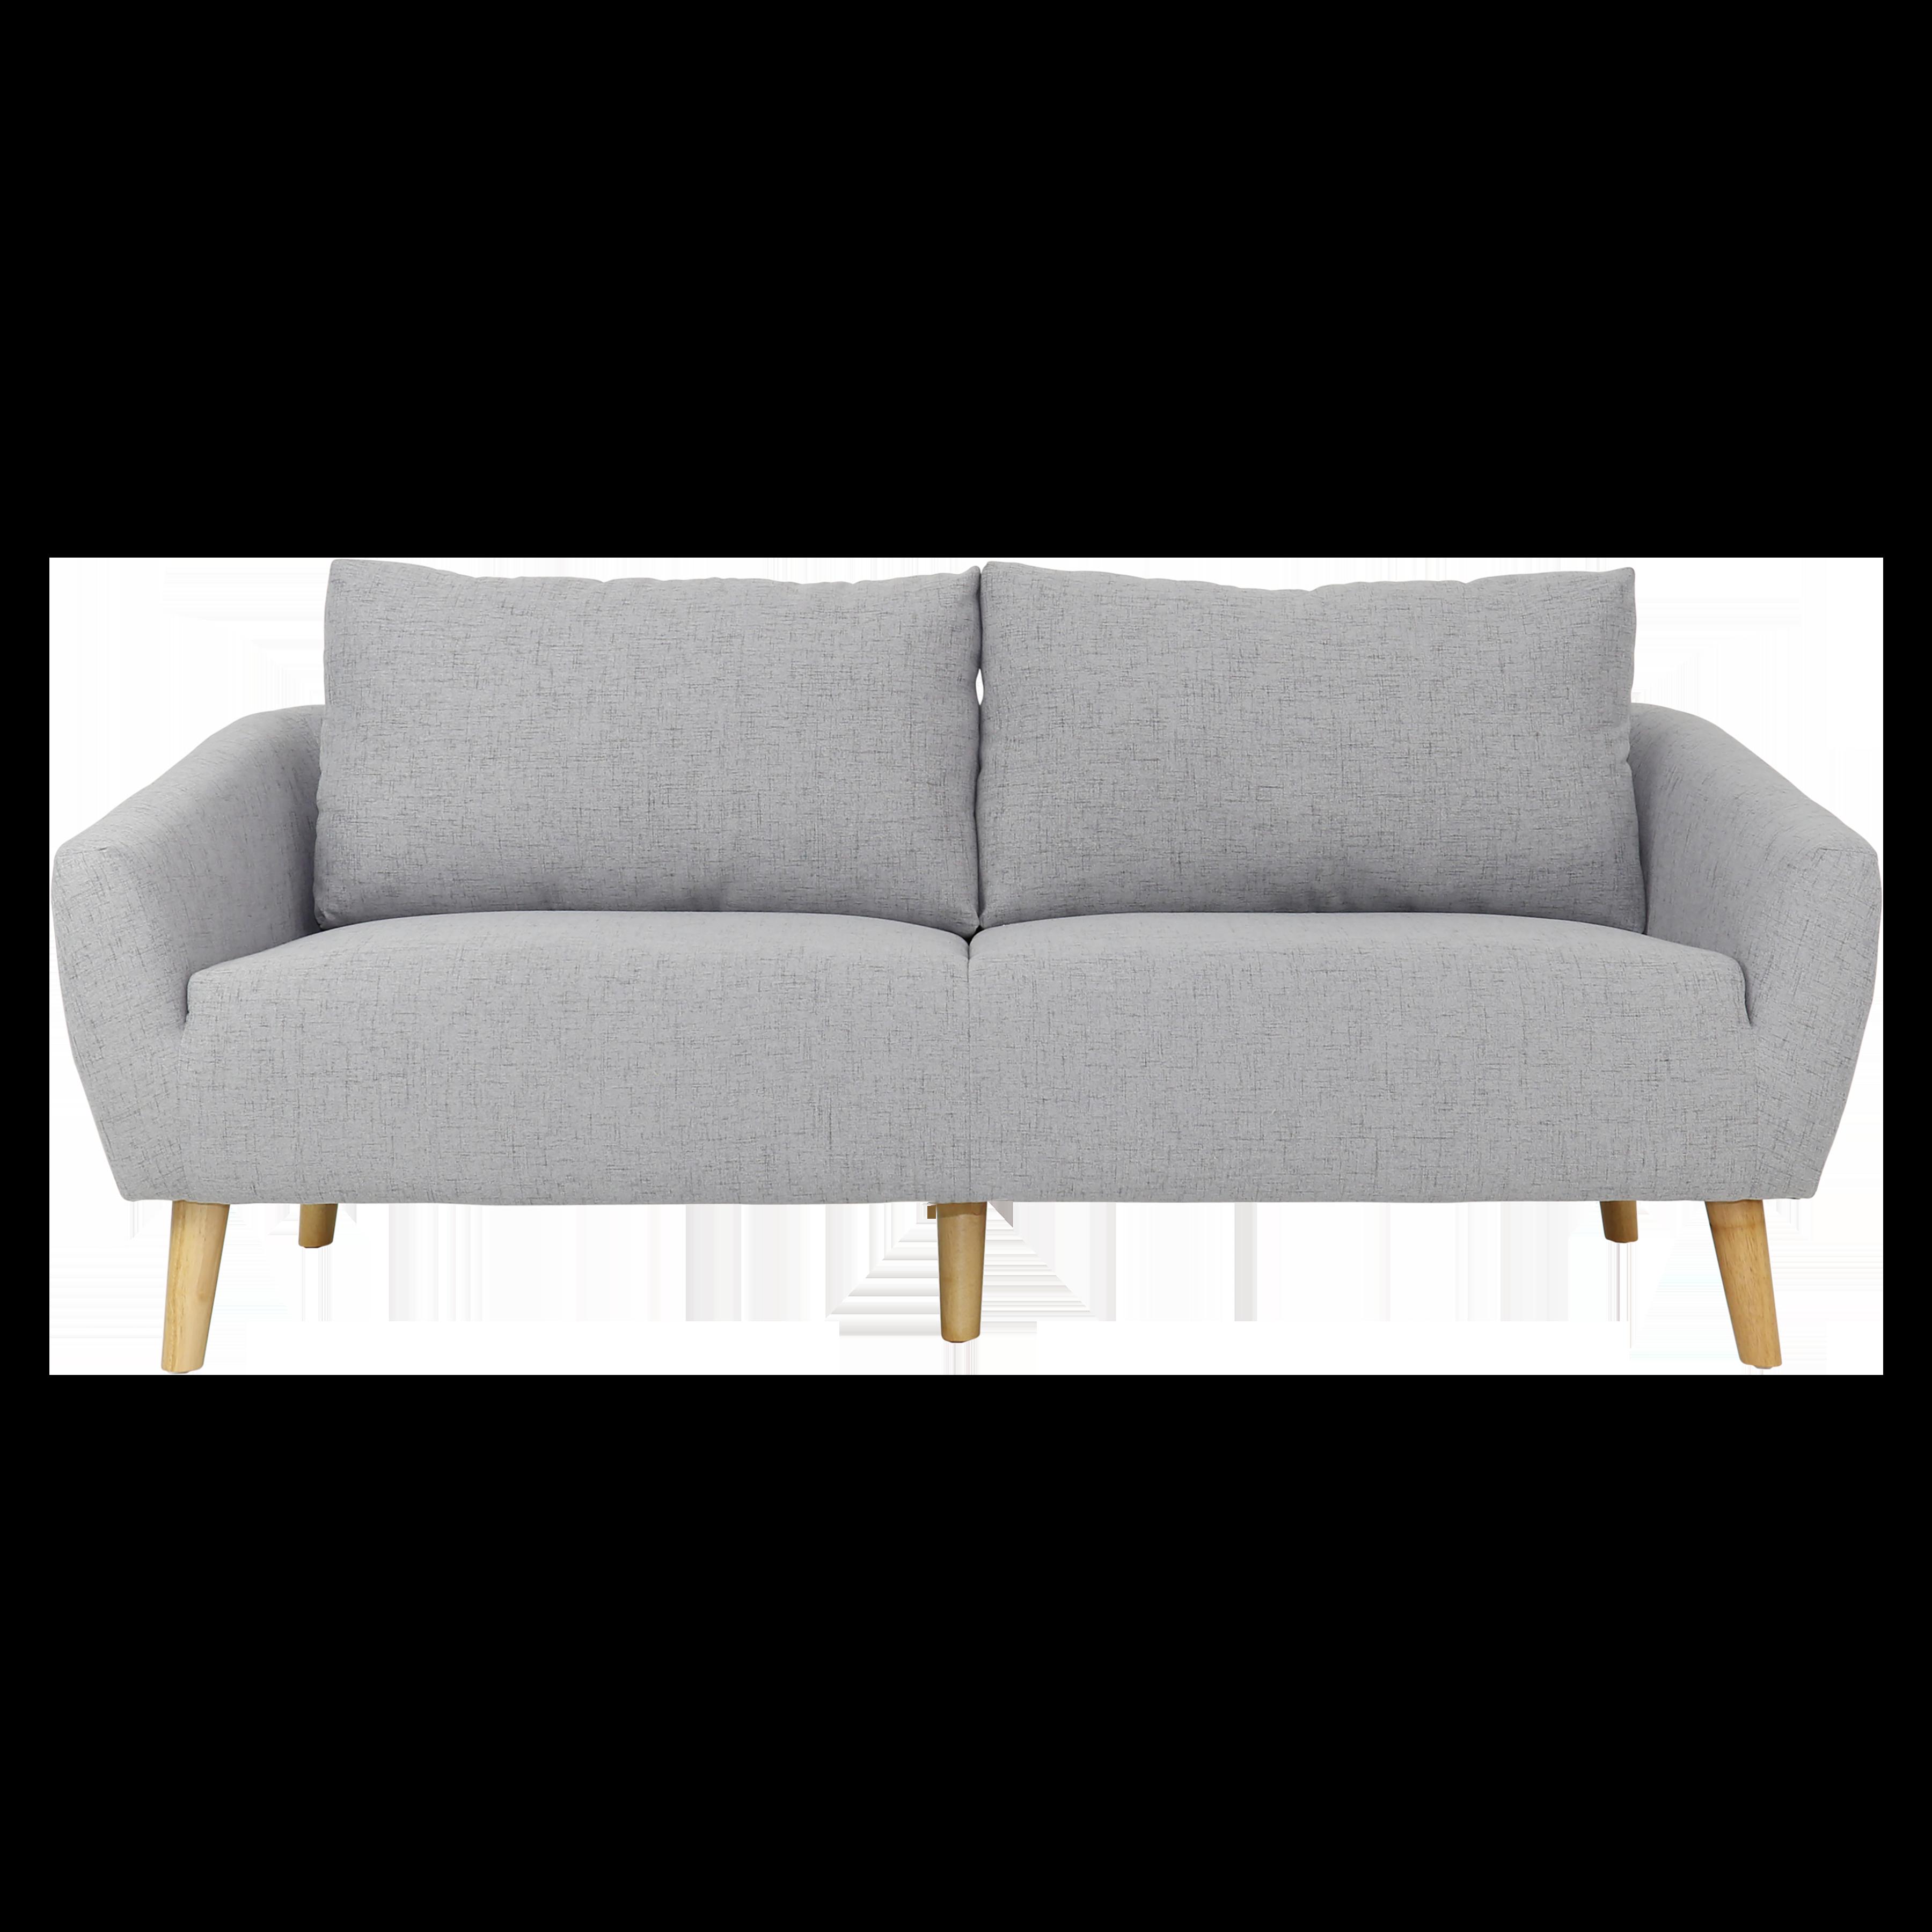 Marvelous Hipvan Hana 3 Seater Sofa Light Grey In 2019 Products Cjindustries Chair Design For Home Cjindustriesco